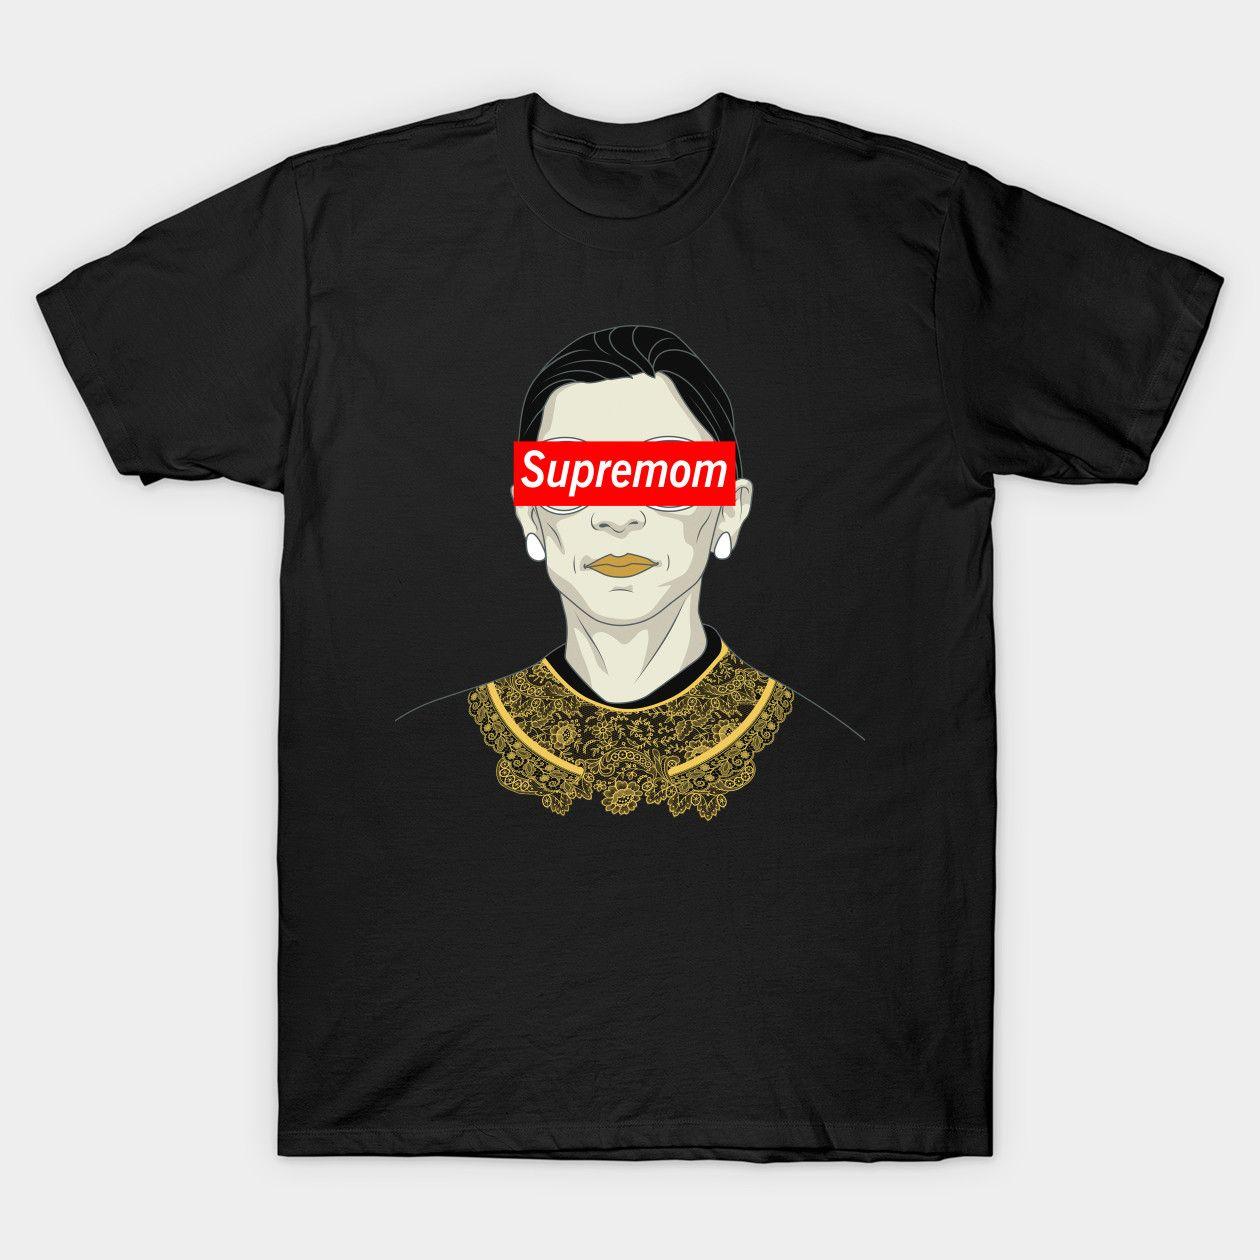 Is Supremom Classic Shirts